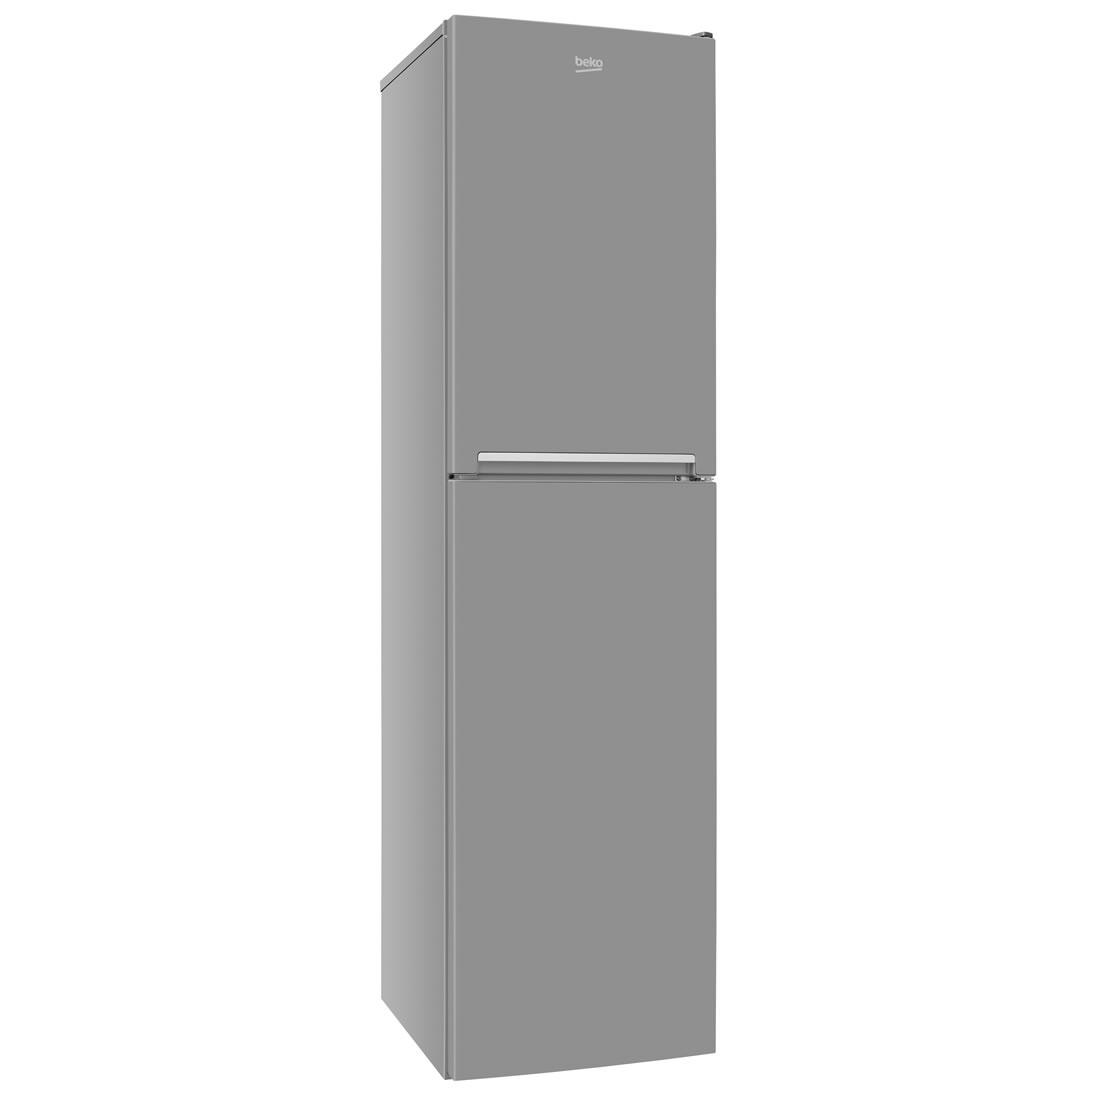 CFG1501S 268litre Fridge Freezer Frost Free Class A+ Silver